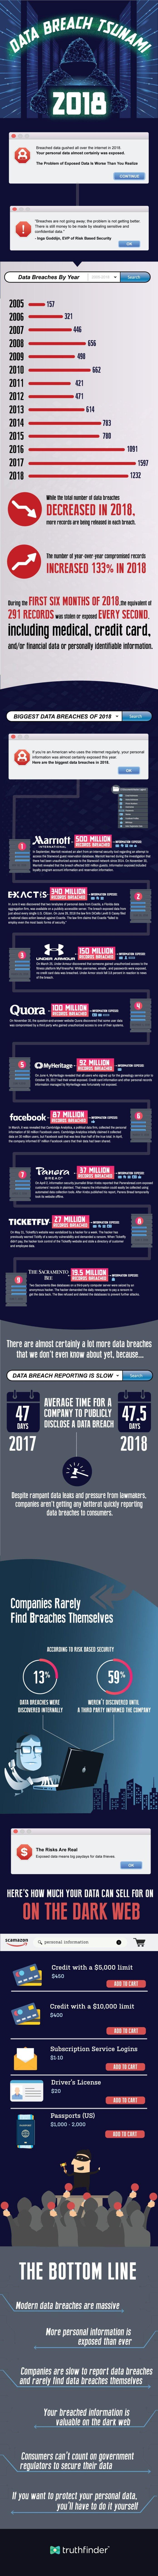 Data Breach Tsunami 2018